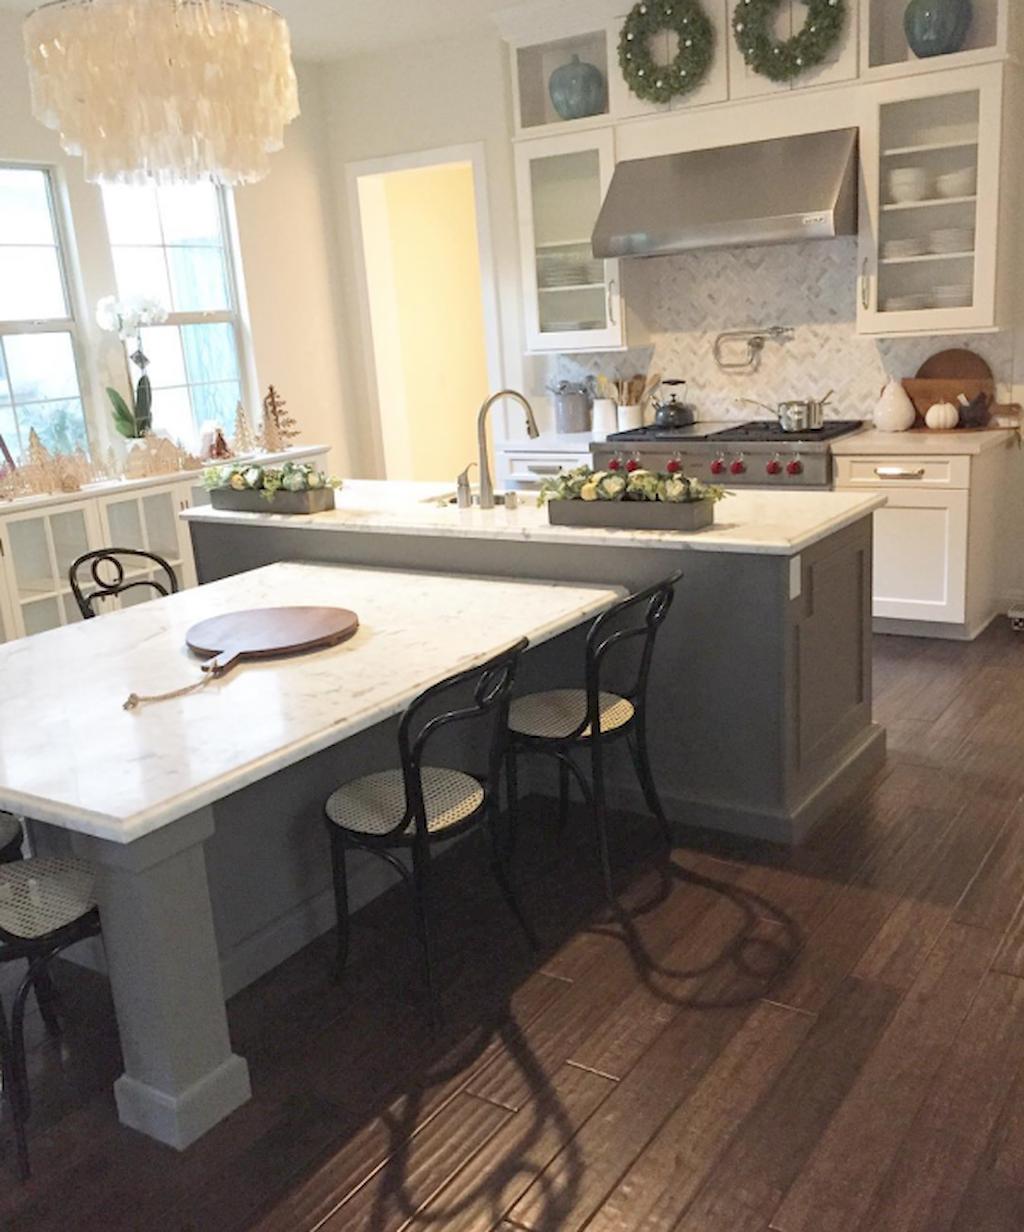 Stunning Small Island Kitchen Table Ideas Home To Z Kitchen Island Dining Table Kitchen Design Small Kitchen Island Table